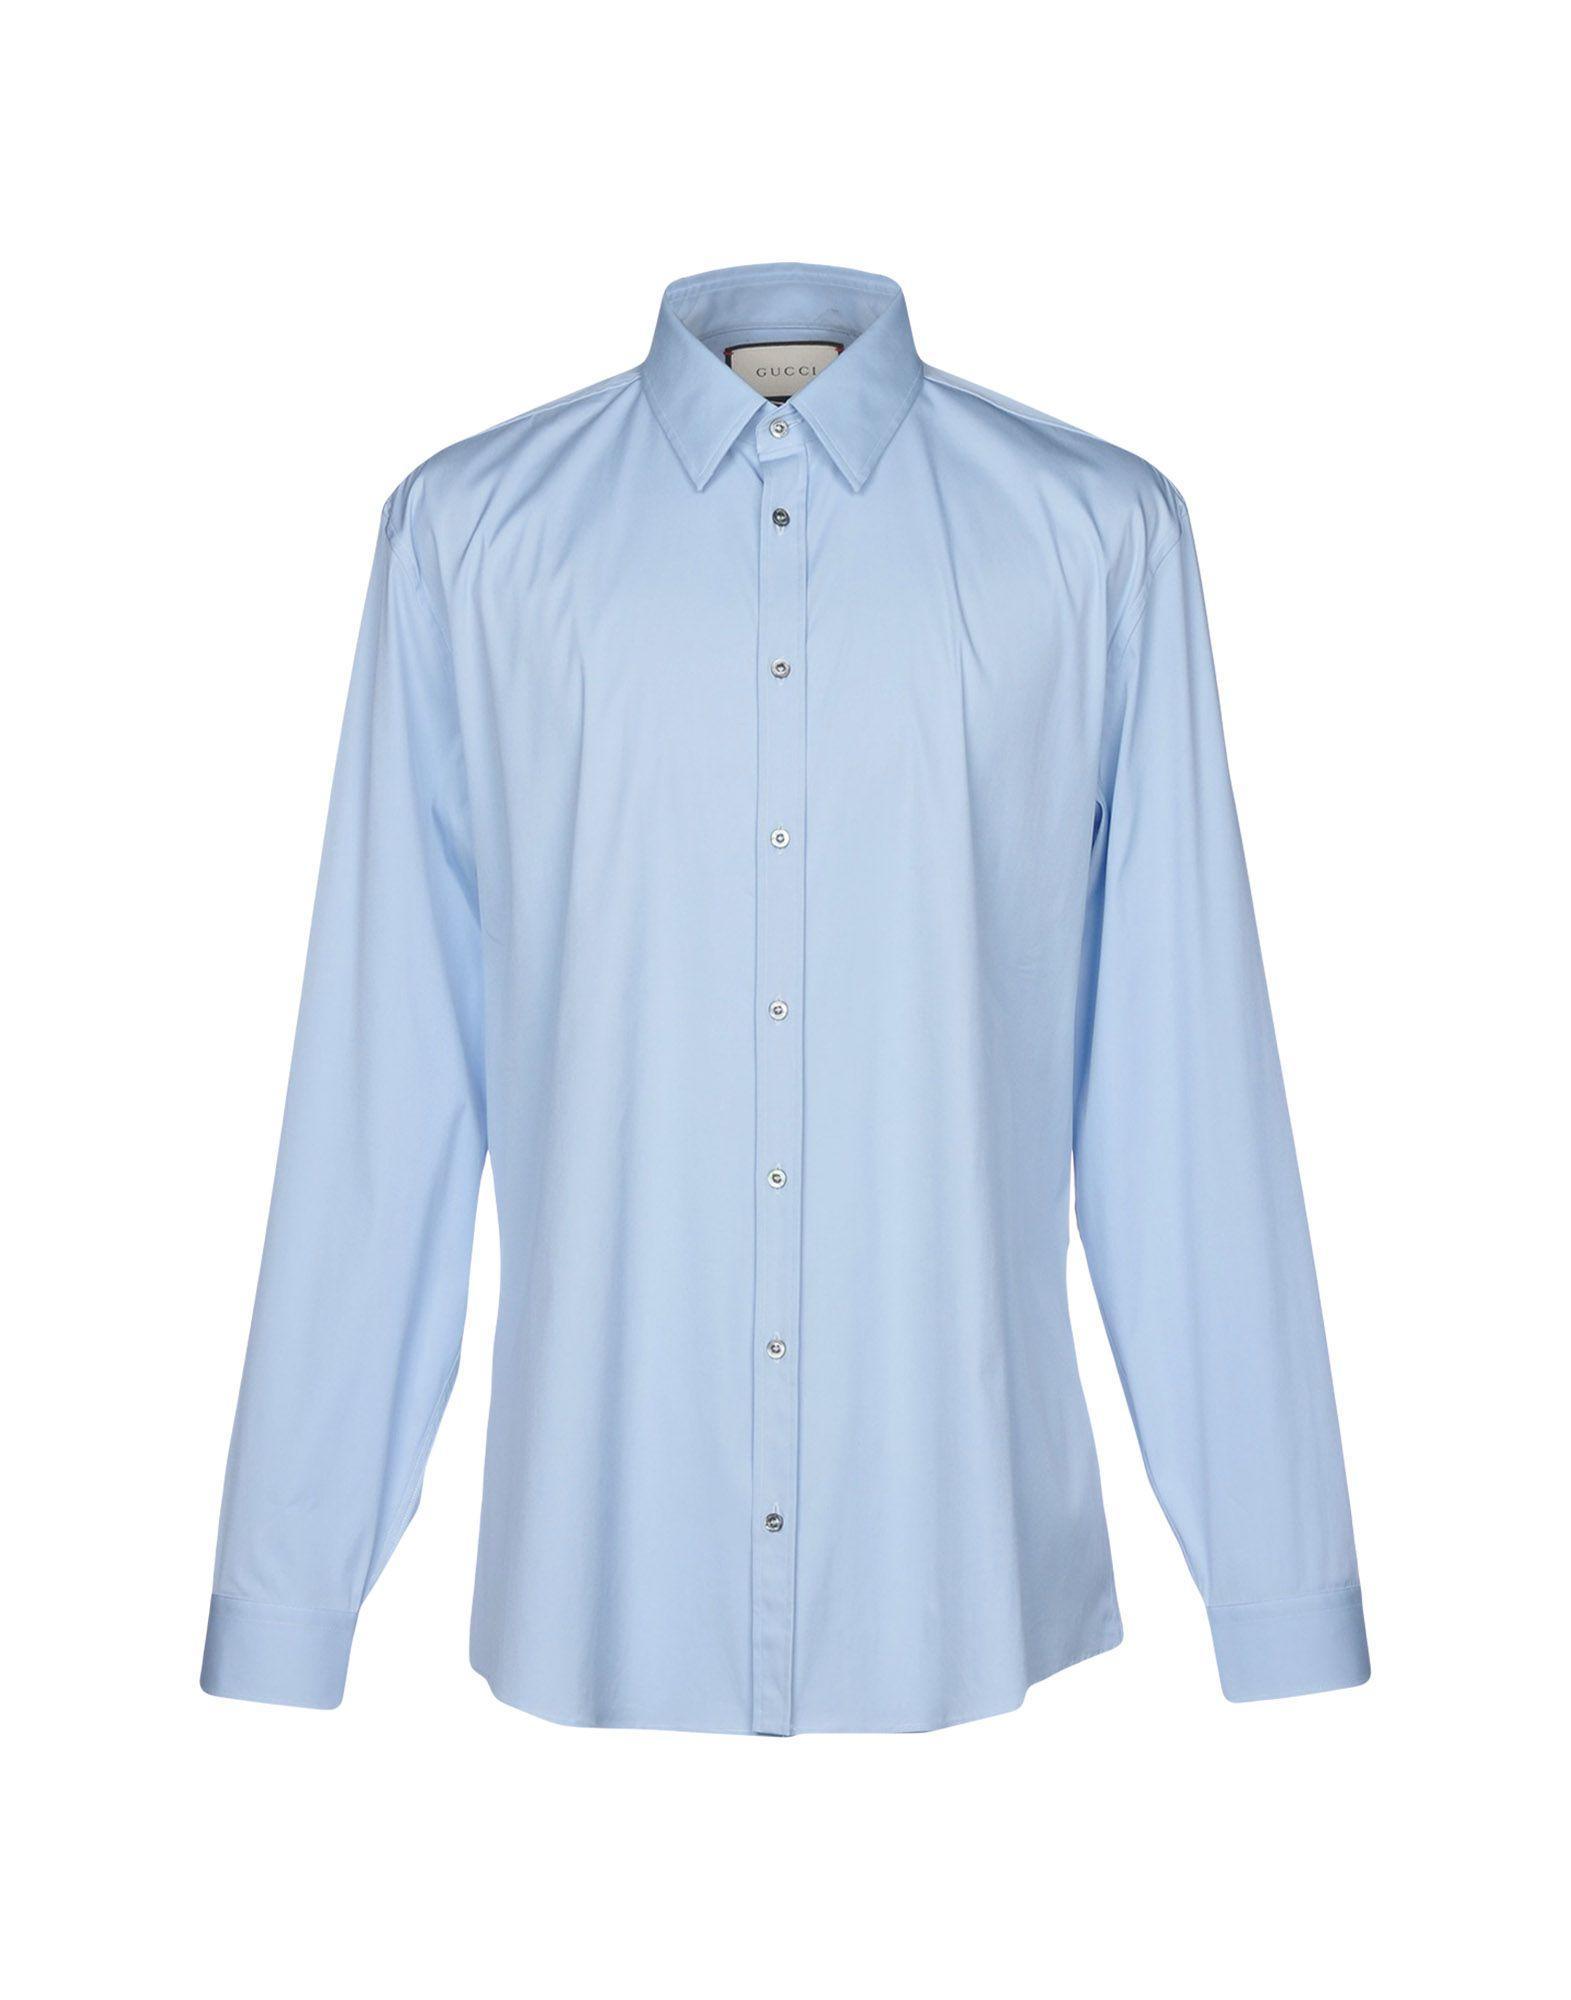 3b3f3cc93 Gucci Shirts In Sky Blue   ModeSens